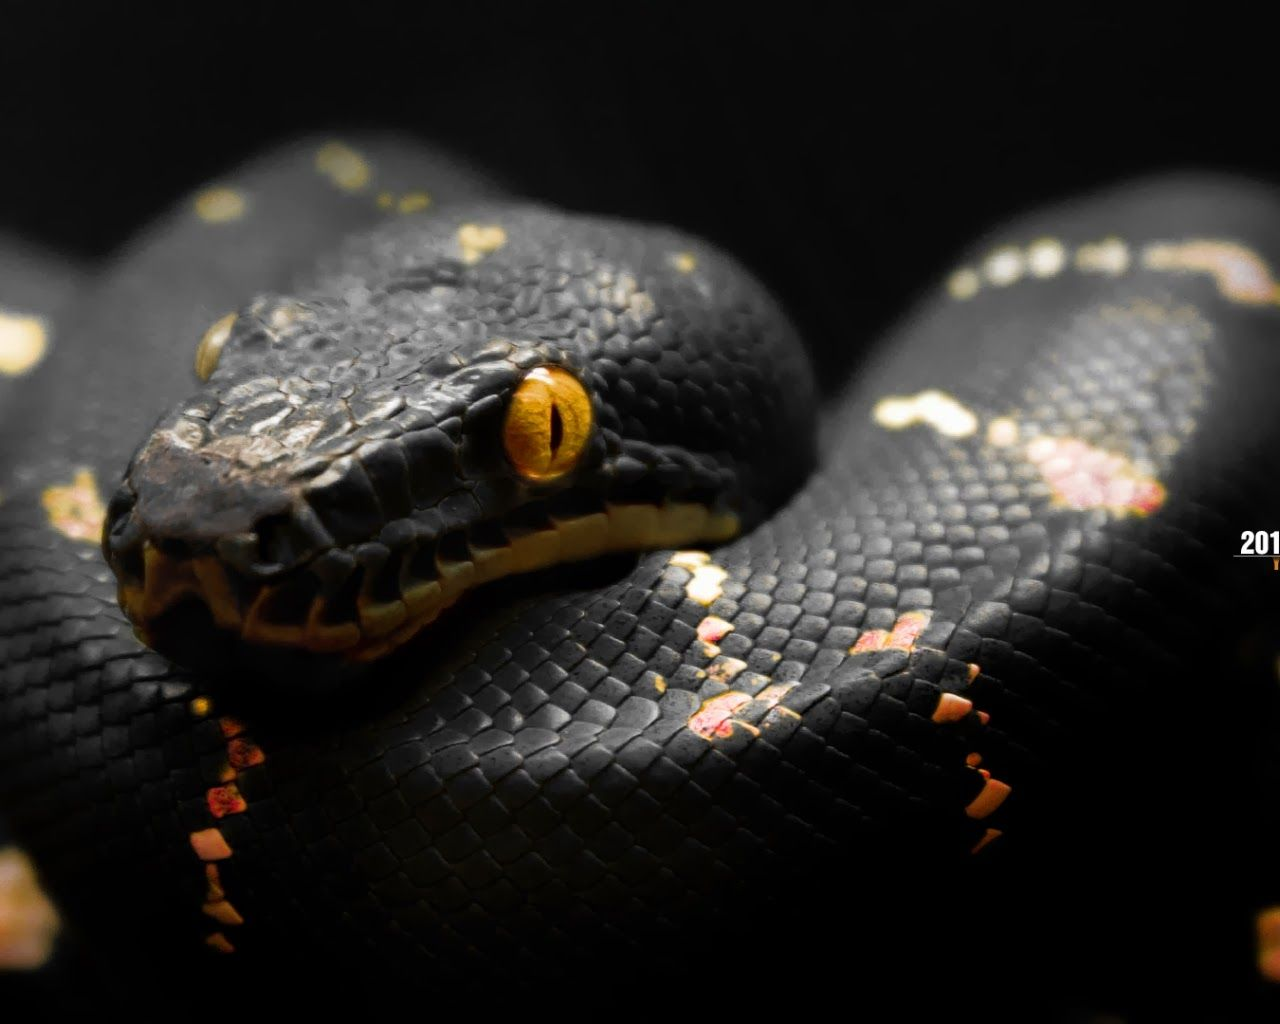 world best dangerous snake hd wallpapers - hd wallpapers blog